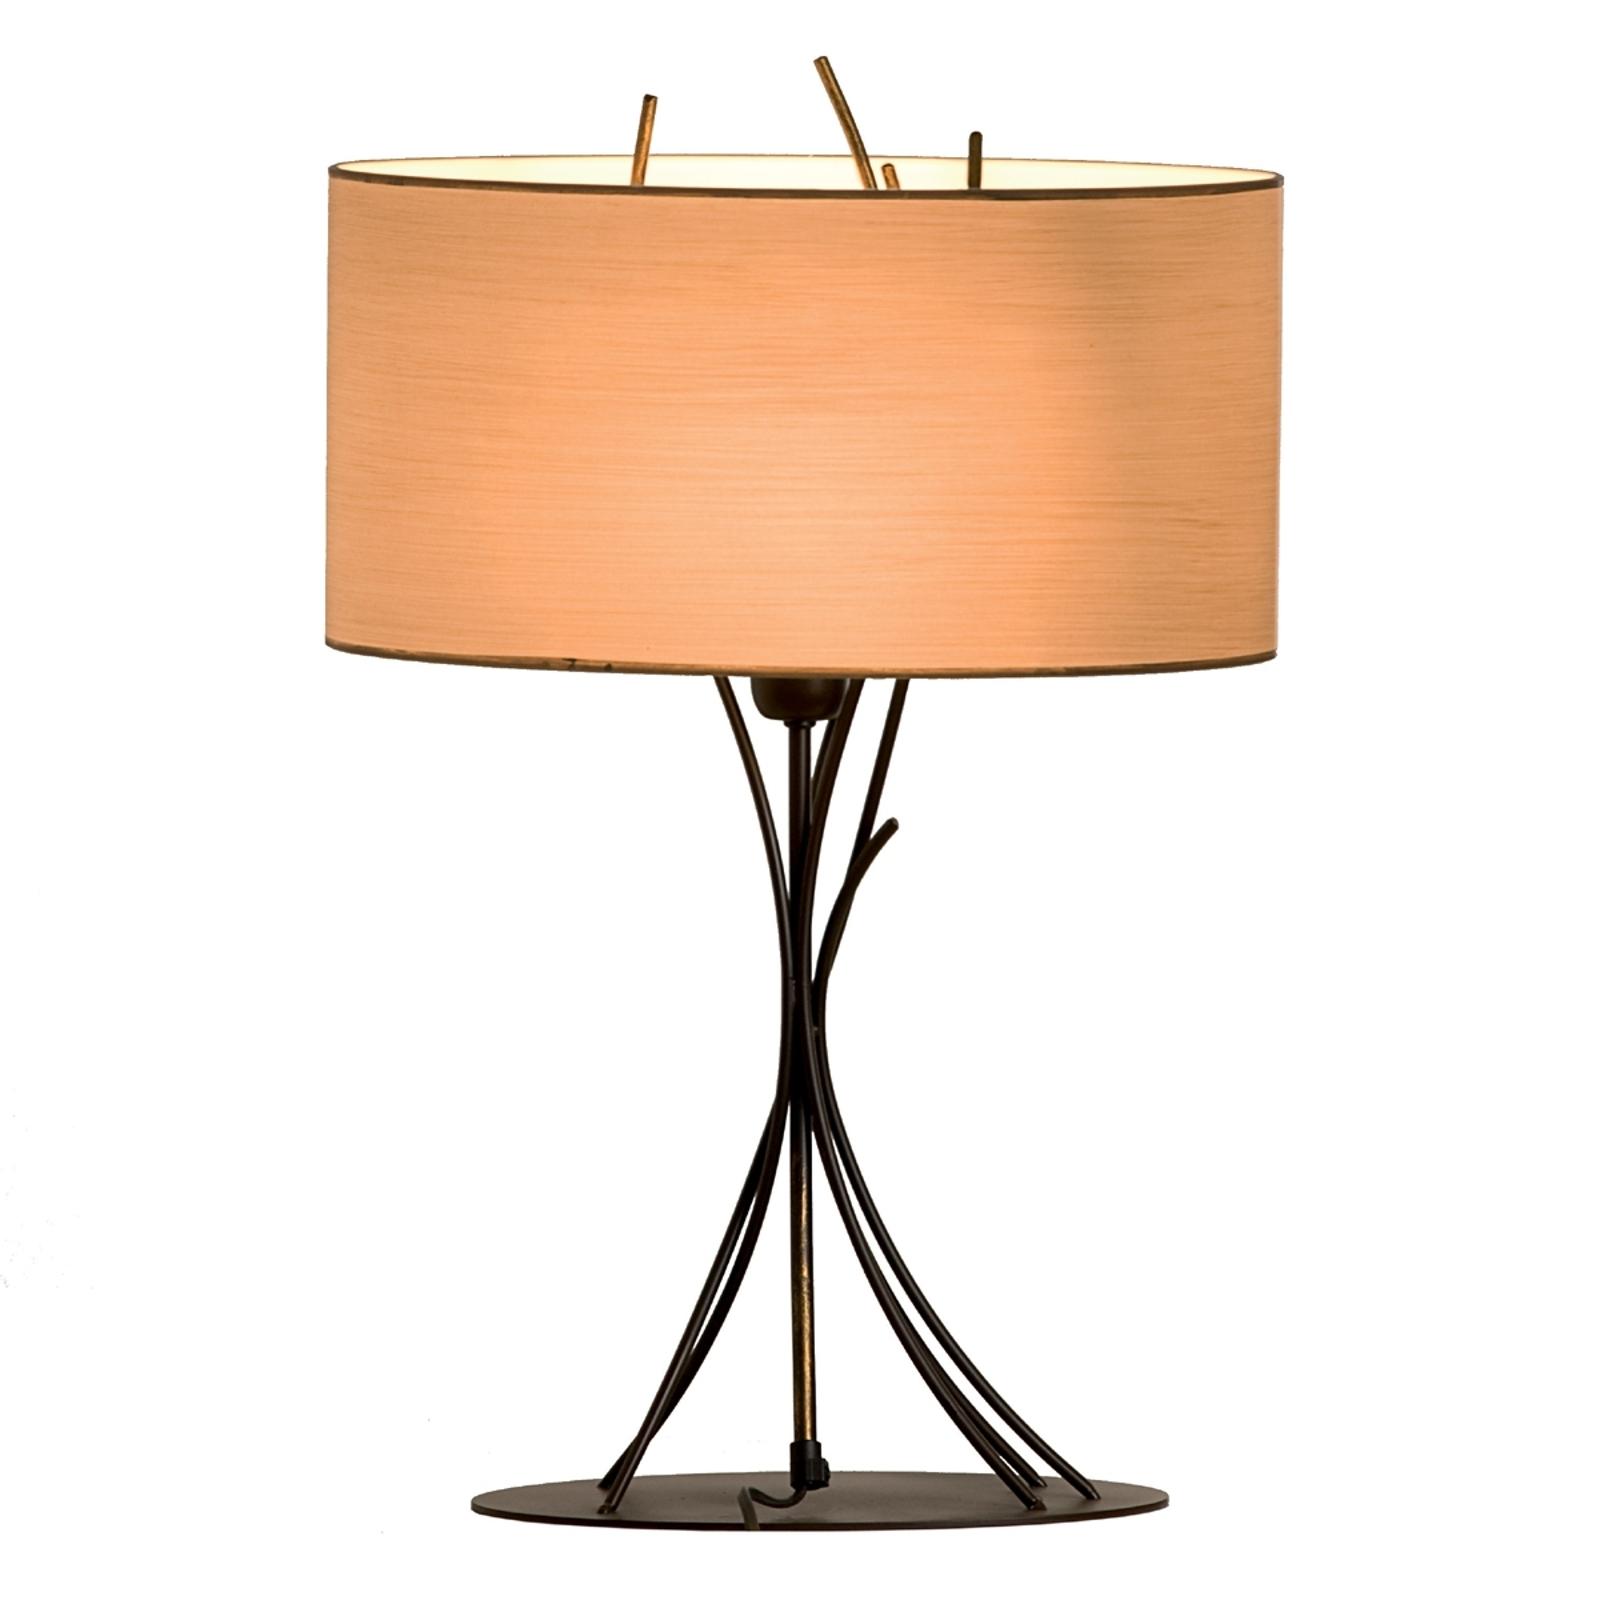 LIVING OVAL - elegante bordslampa